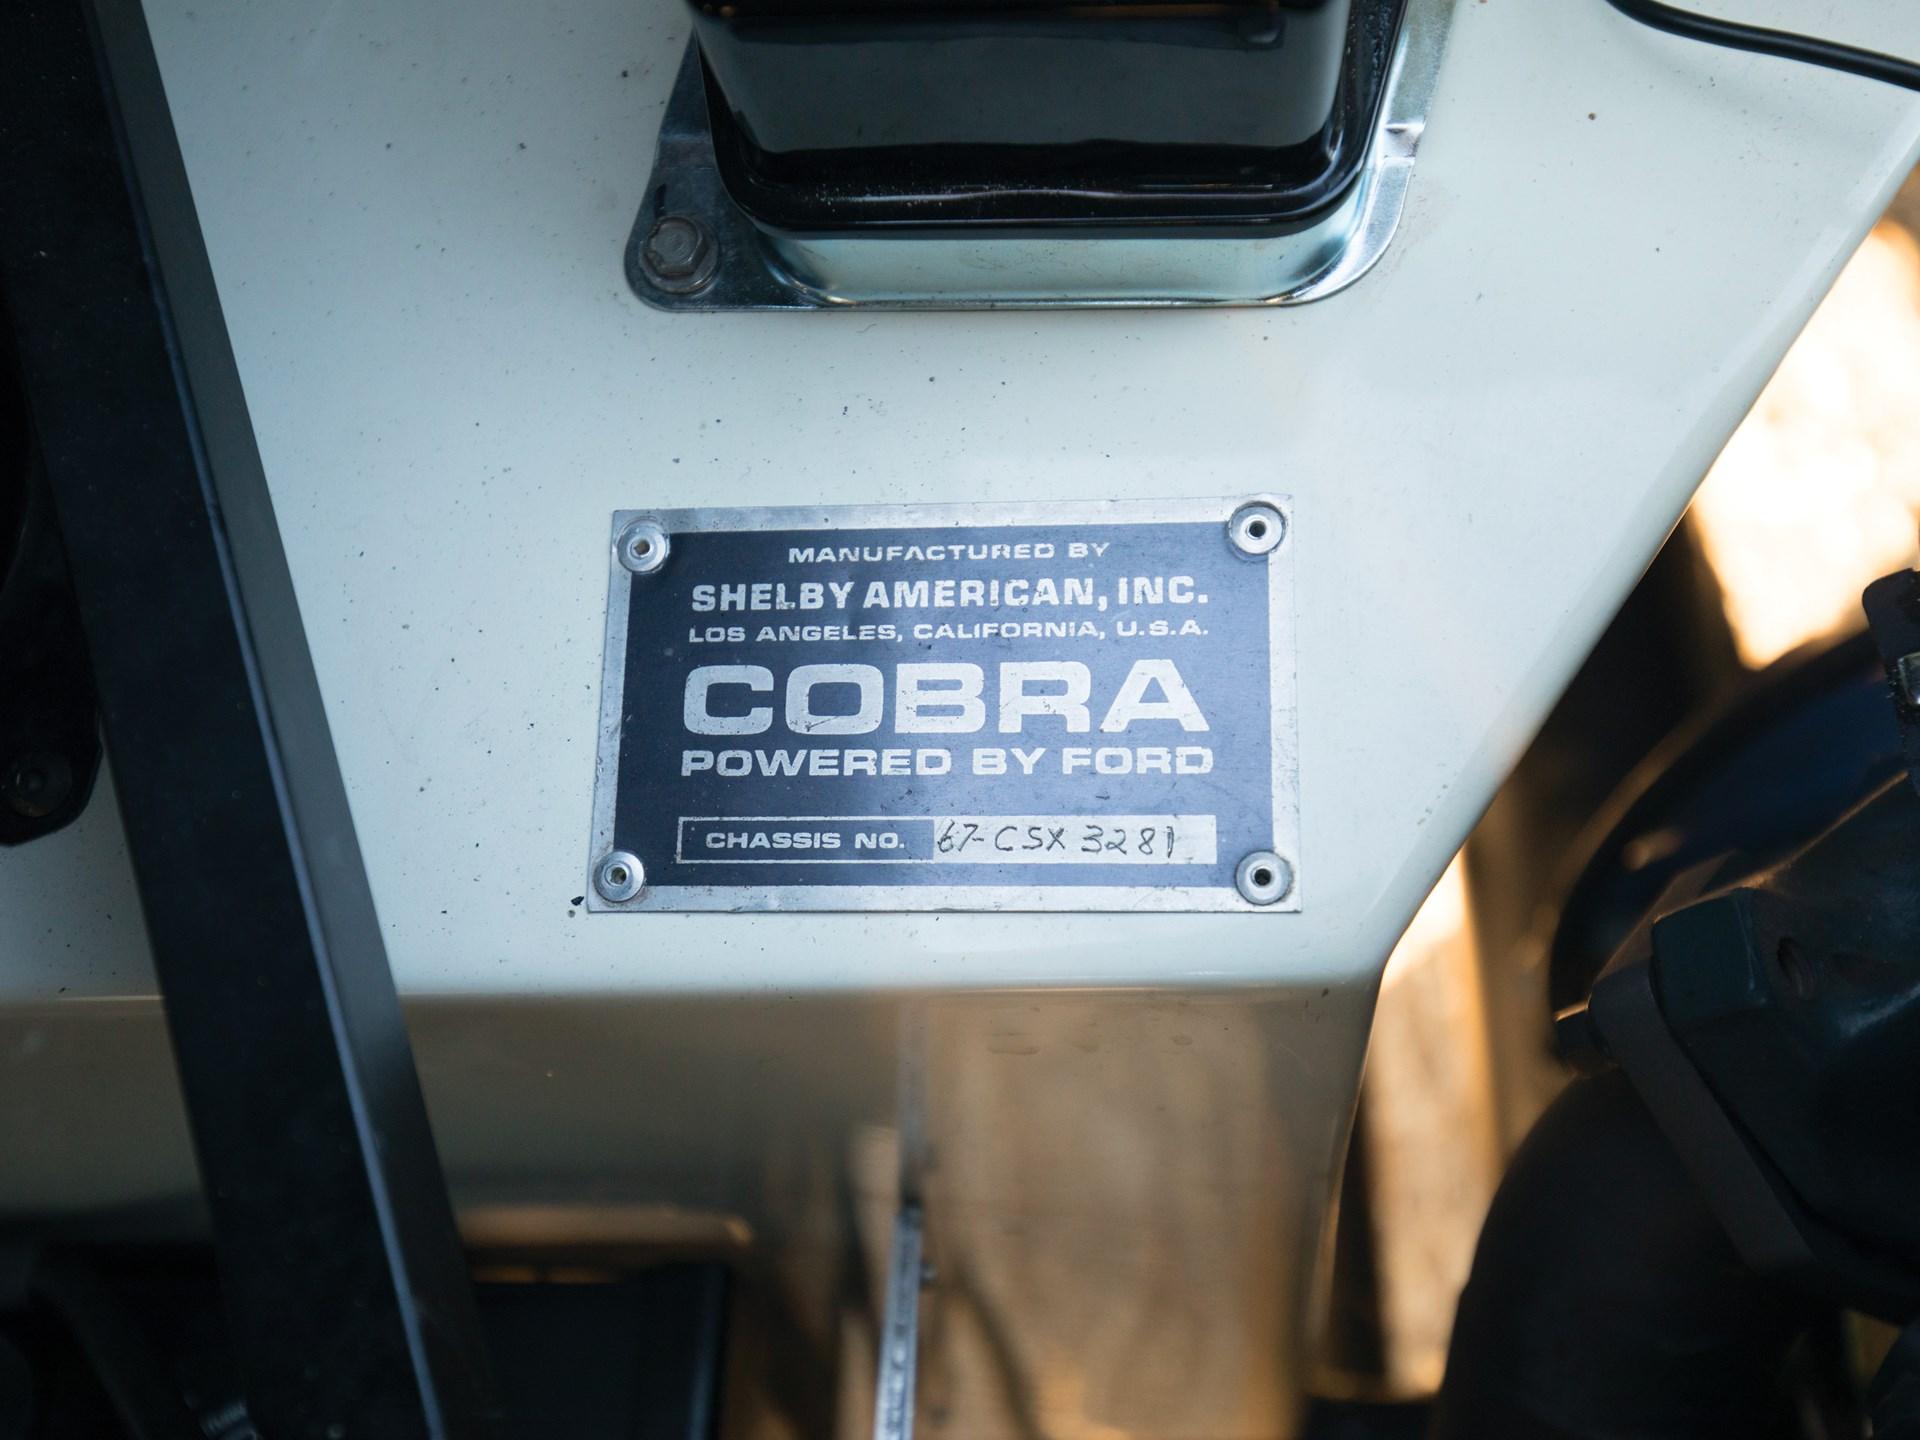 1967 Shelby 427 Cobra VIN plate